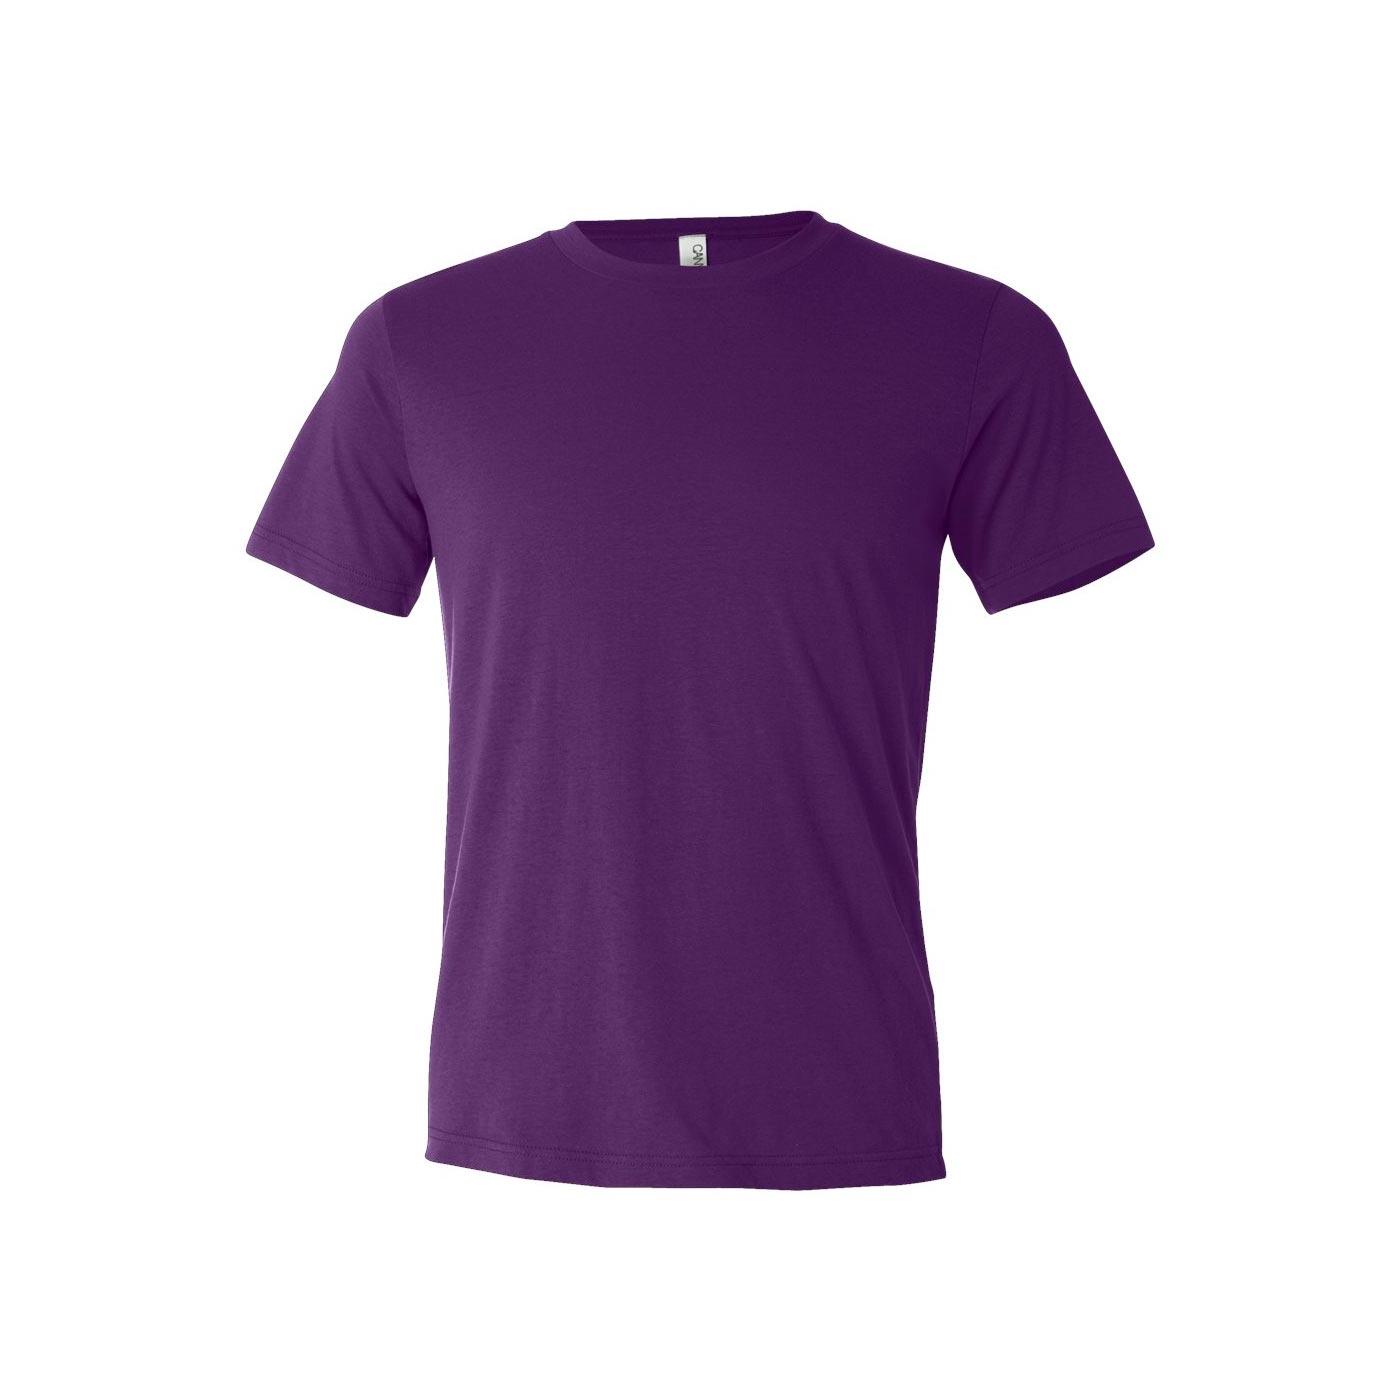 Poly purple